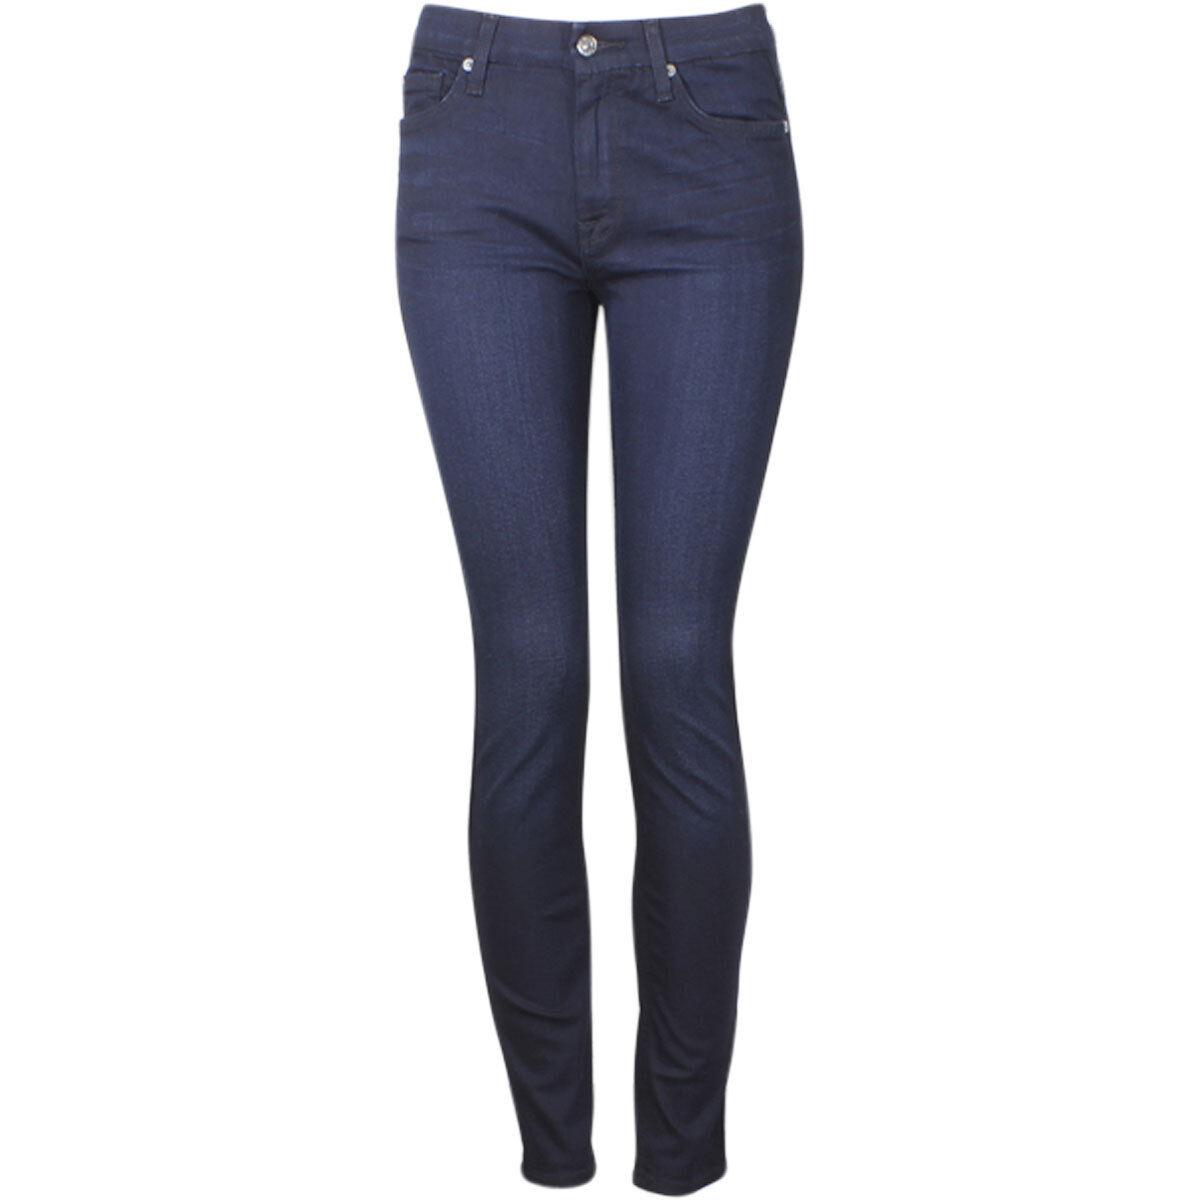 7 For All Mankind (B) Luft Hohe Größe Skinny Blau Schwarz Fluss Themse Jeans